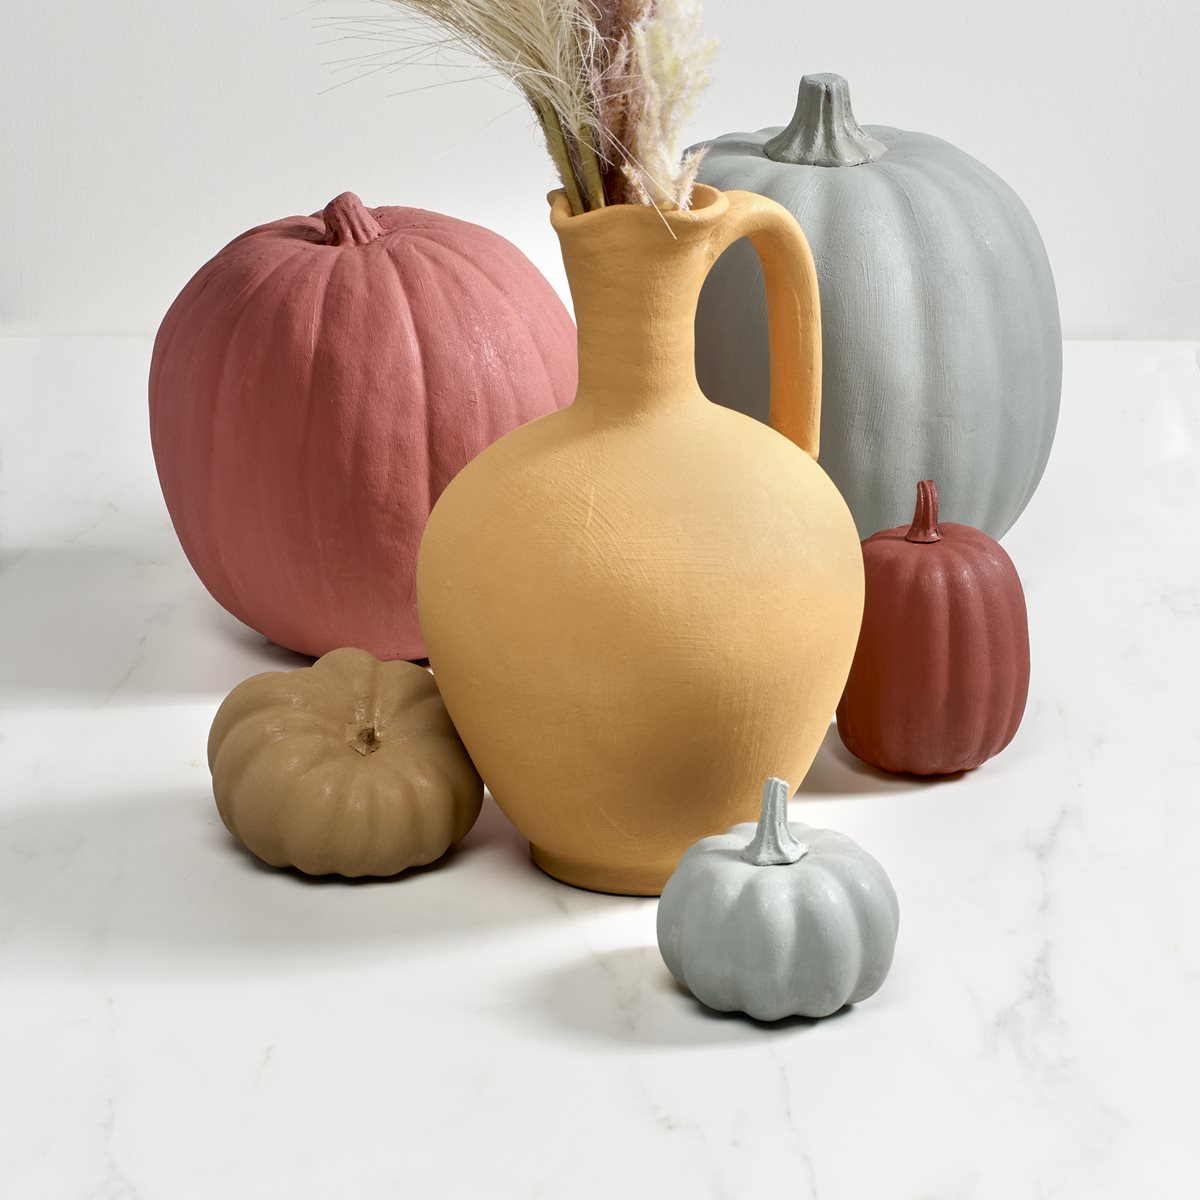 FolkArt Terra Cotta Pumpkins